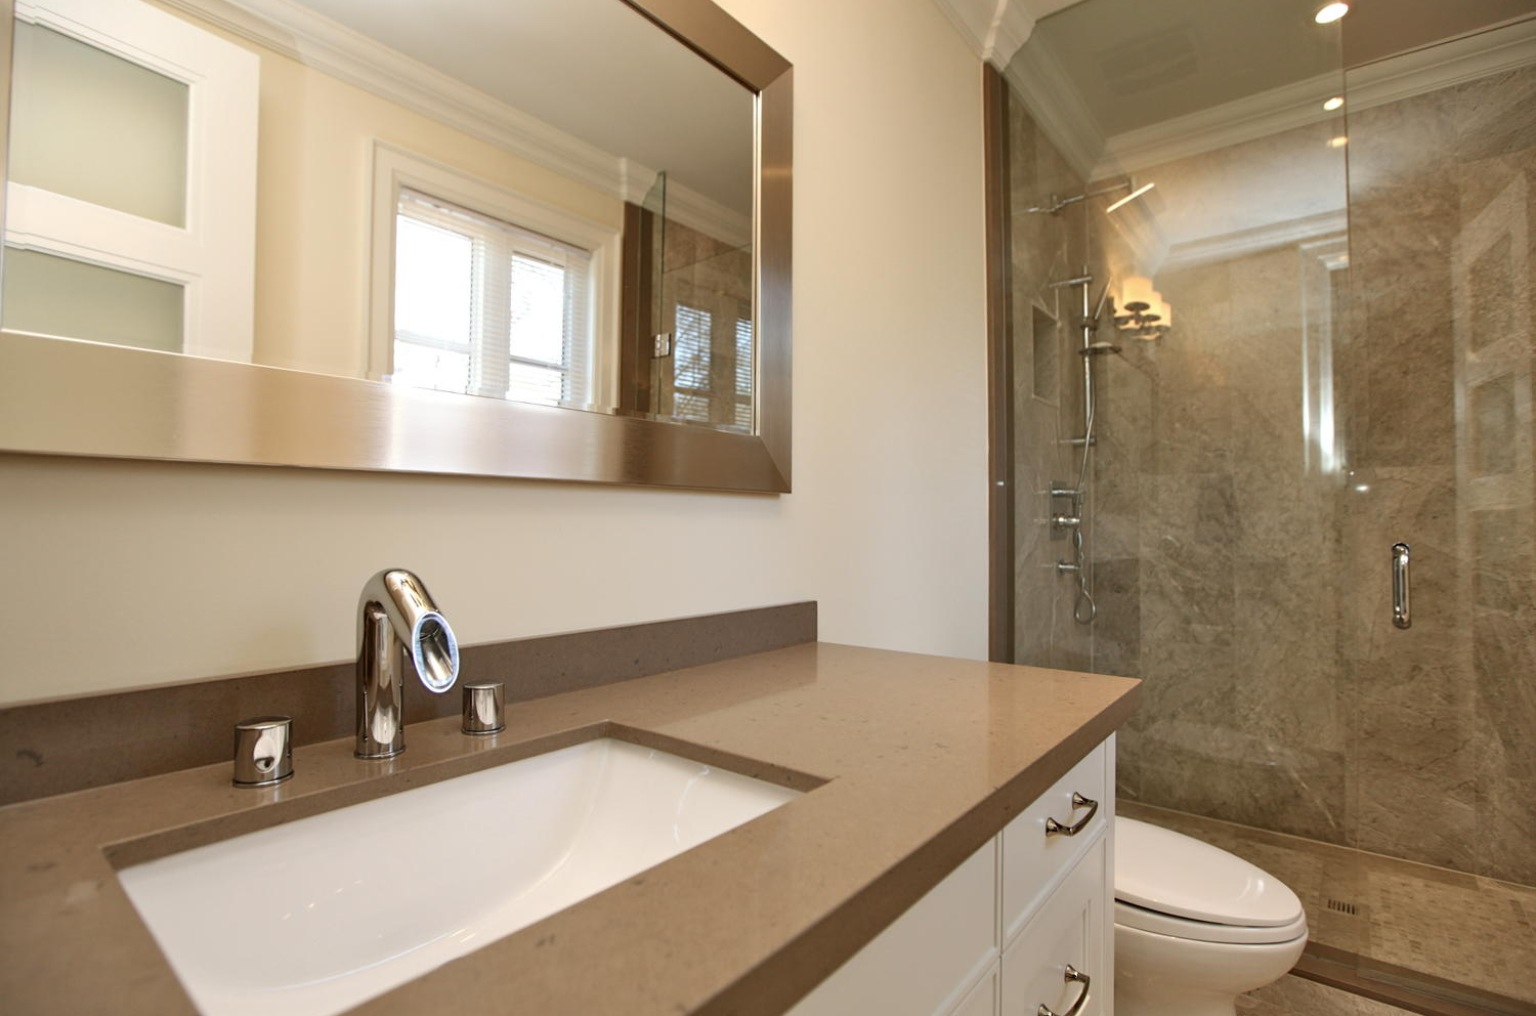 Bathroom Renovations Mississauga Toronto Bathroom Remodeling Toronto